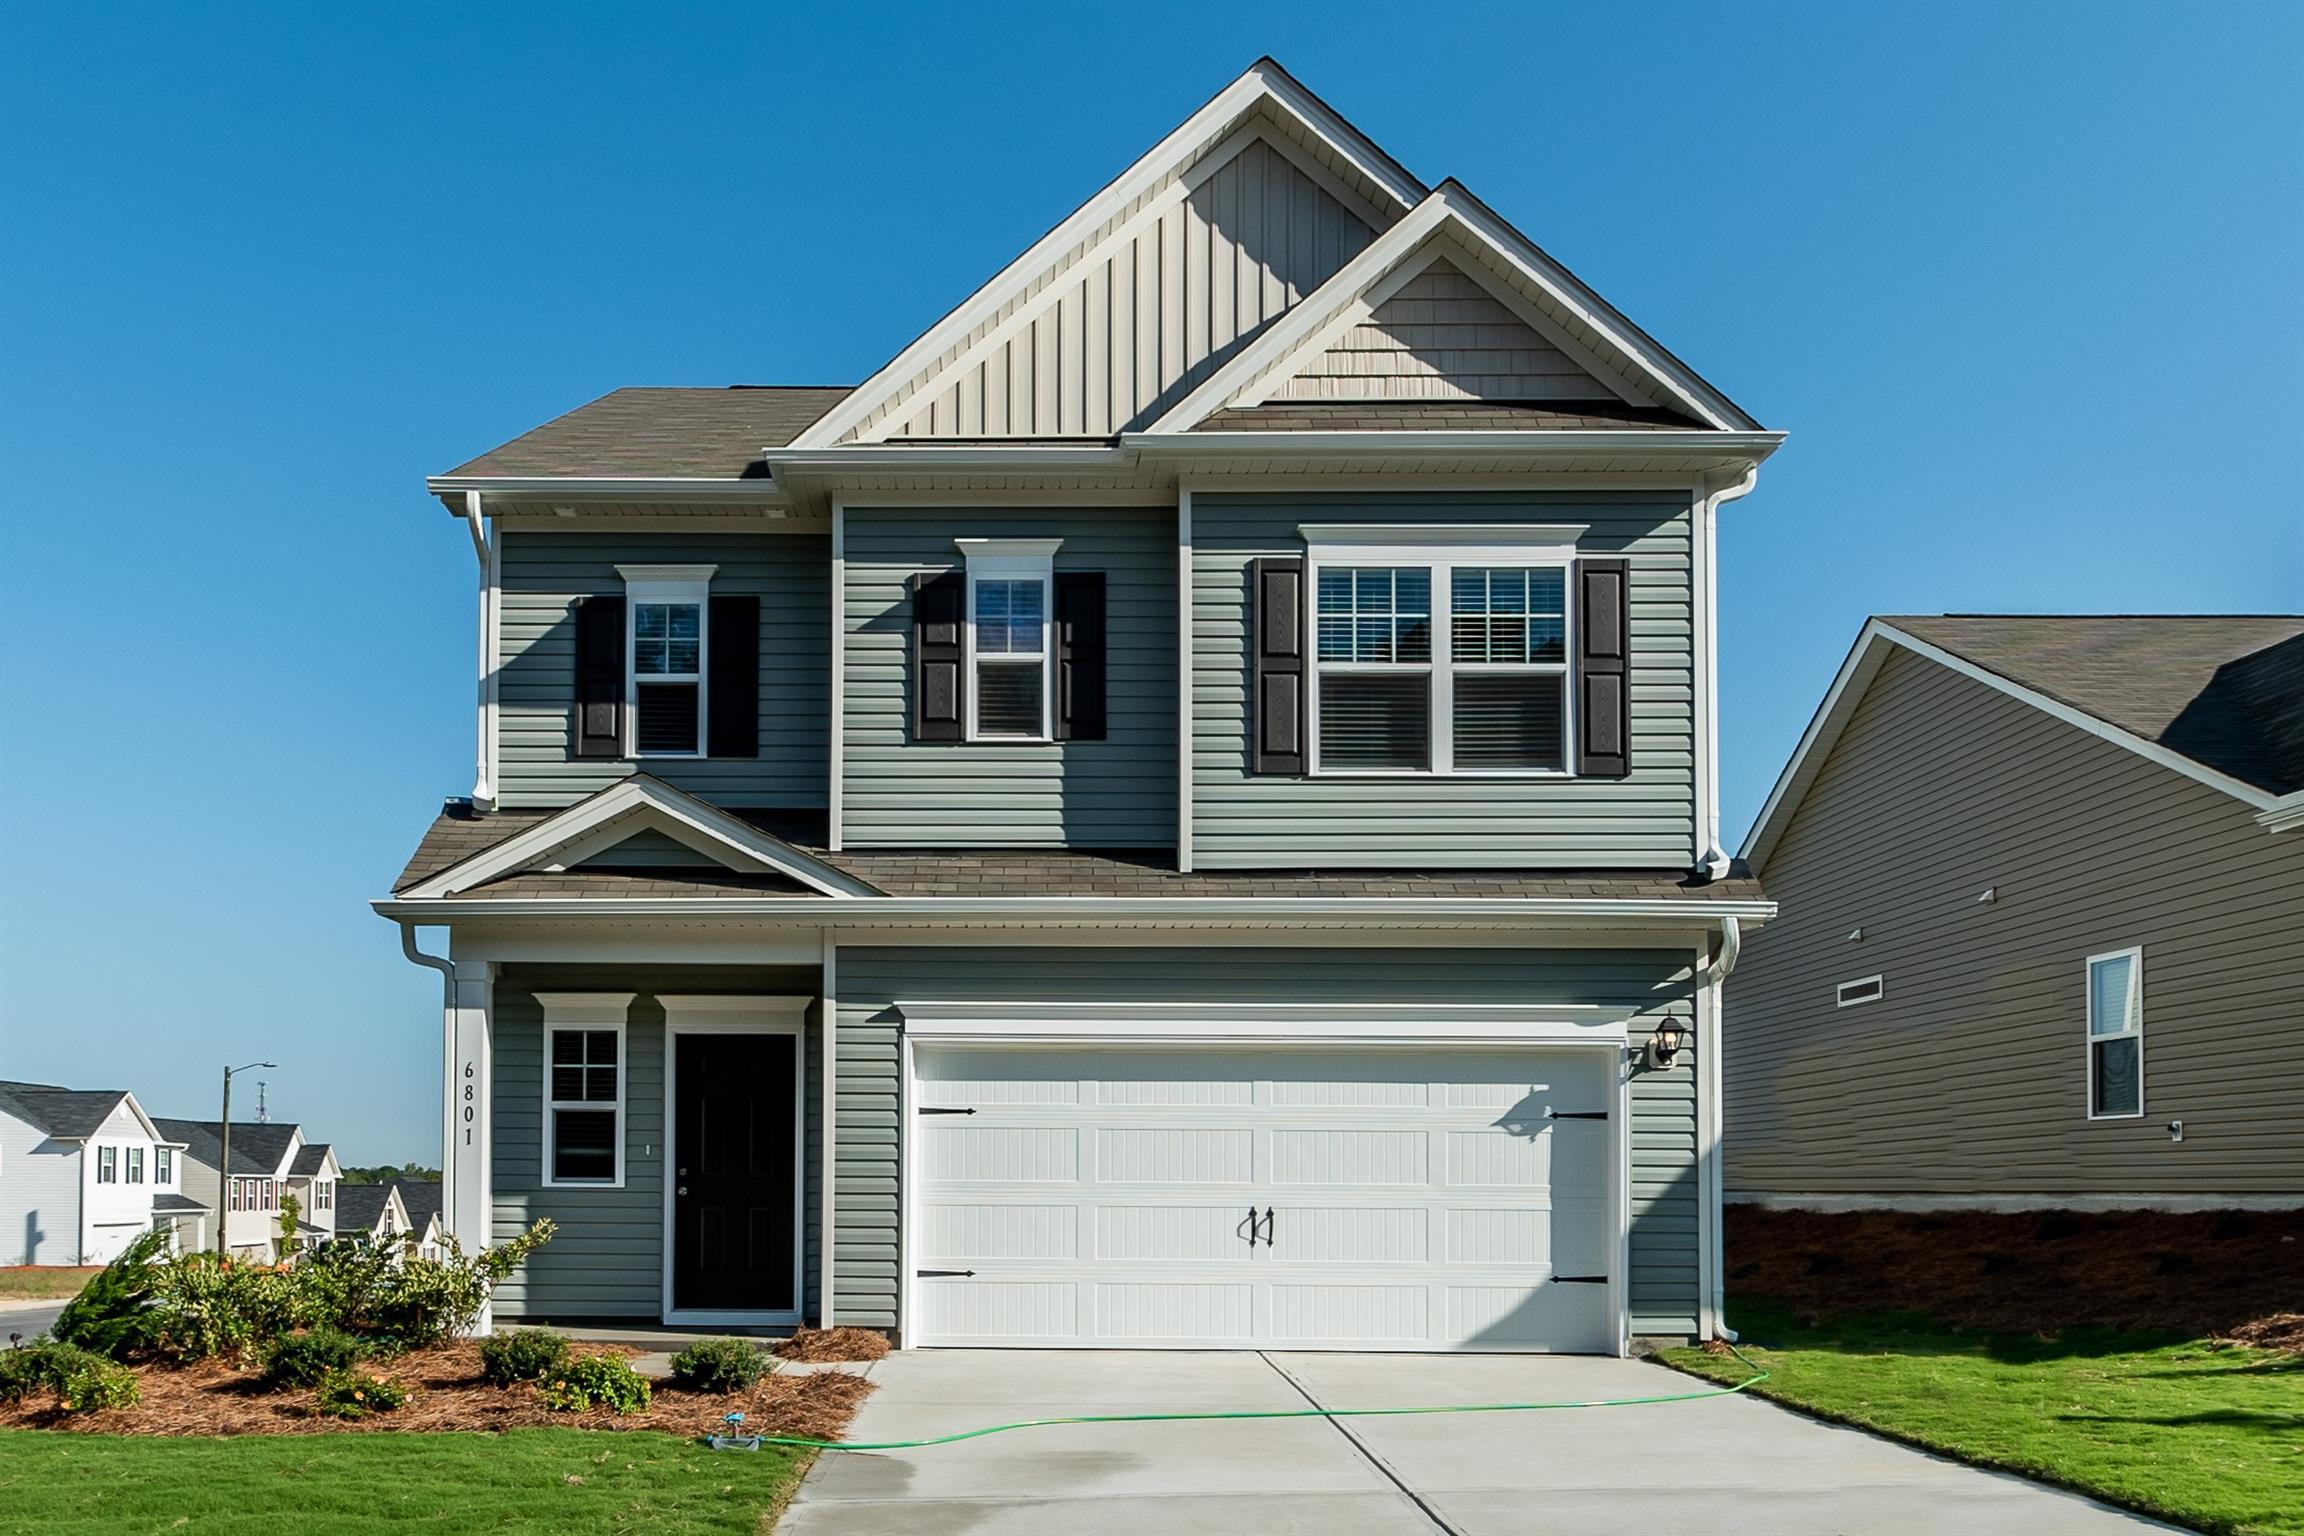 349 Goodtown Trace, Columbia, TN 38401 - Columbia, TN real estate listing